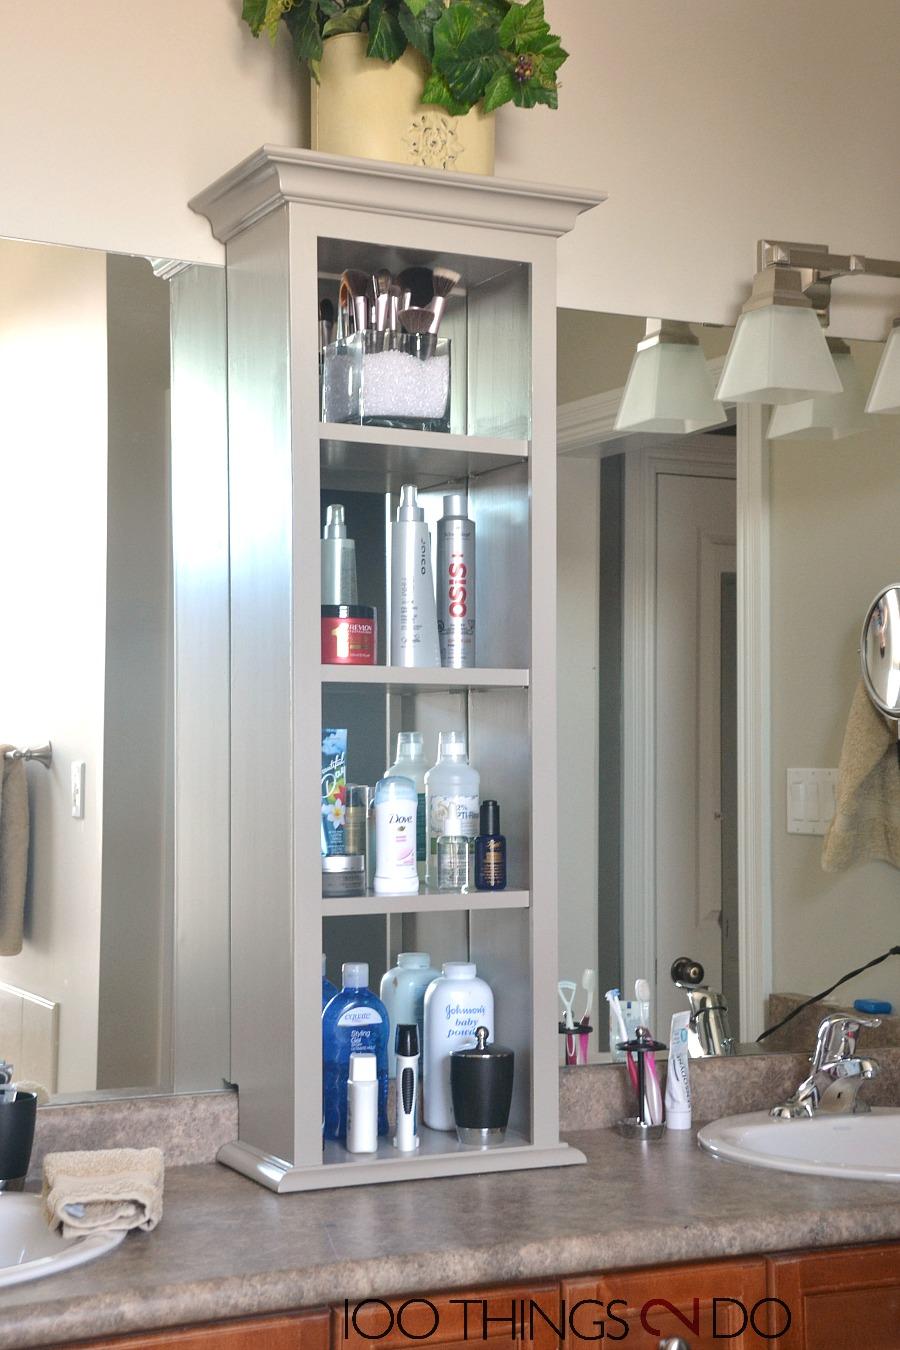 Bathroom Storage Tower - 100 Things 2 Do